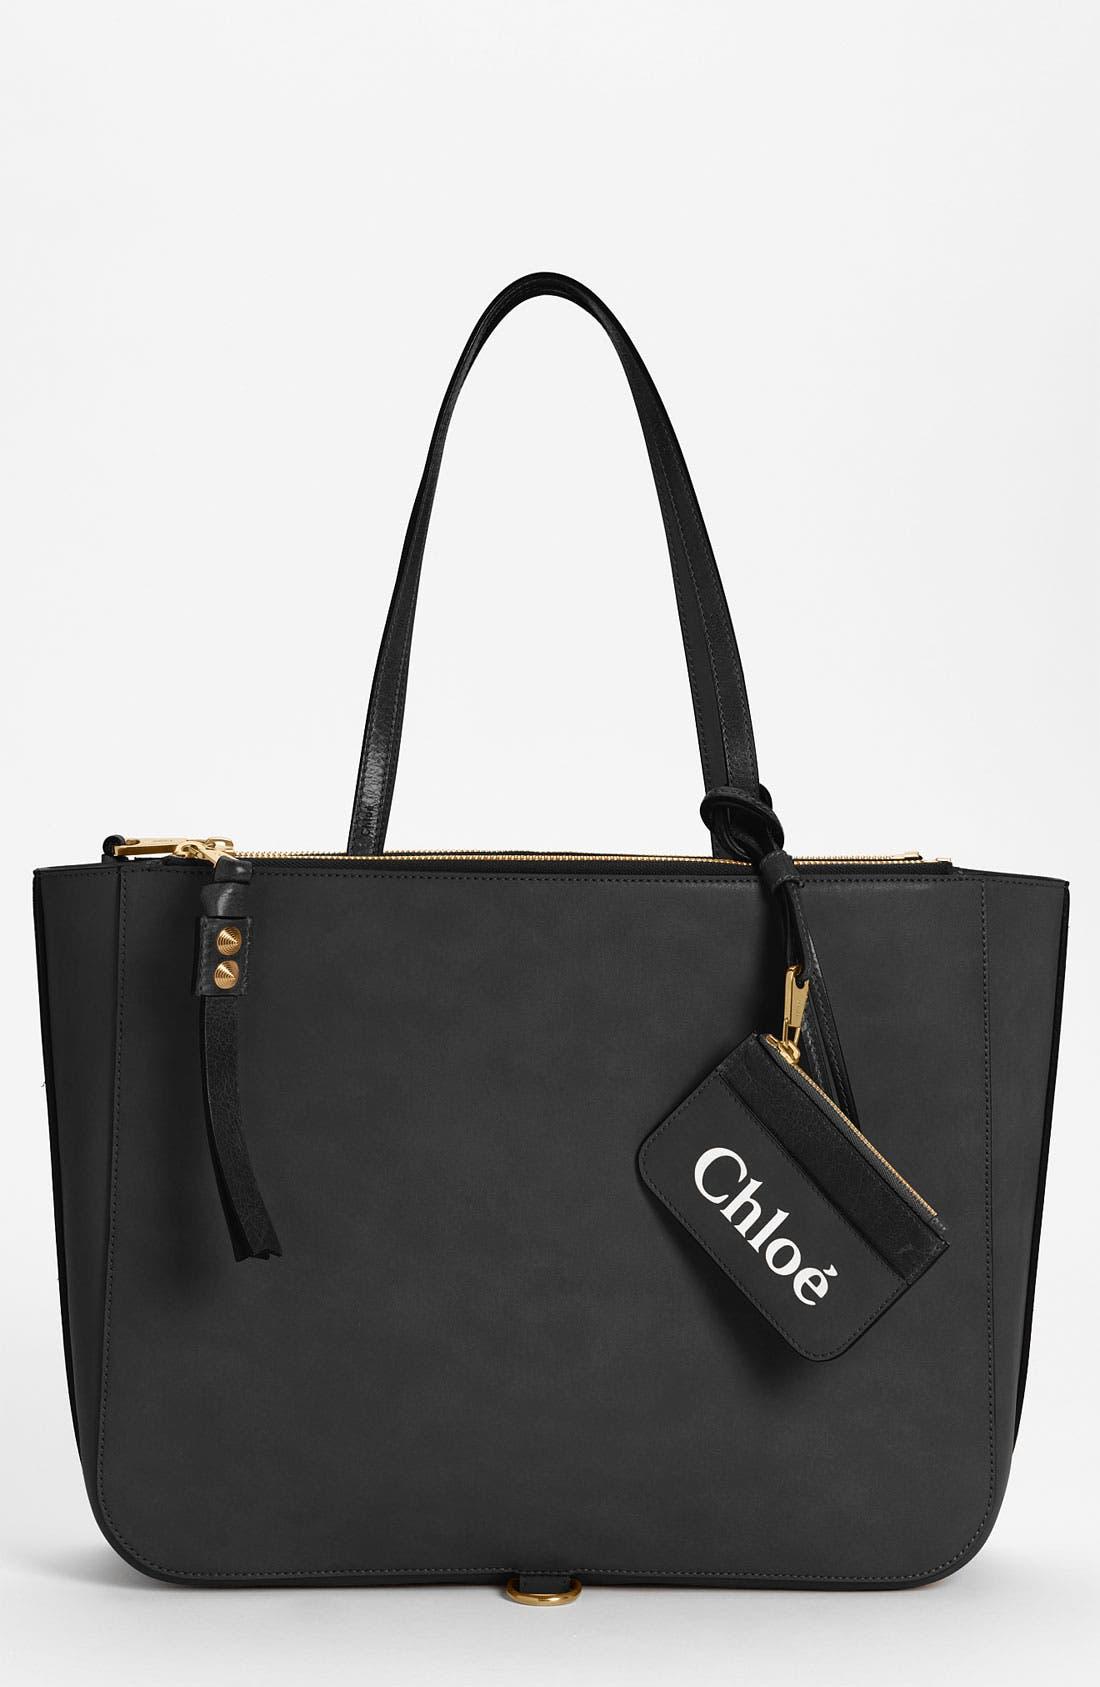 Alternate Image 1 Selected - Chloé 'Sam - Medium' Leather Tote